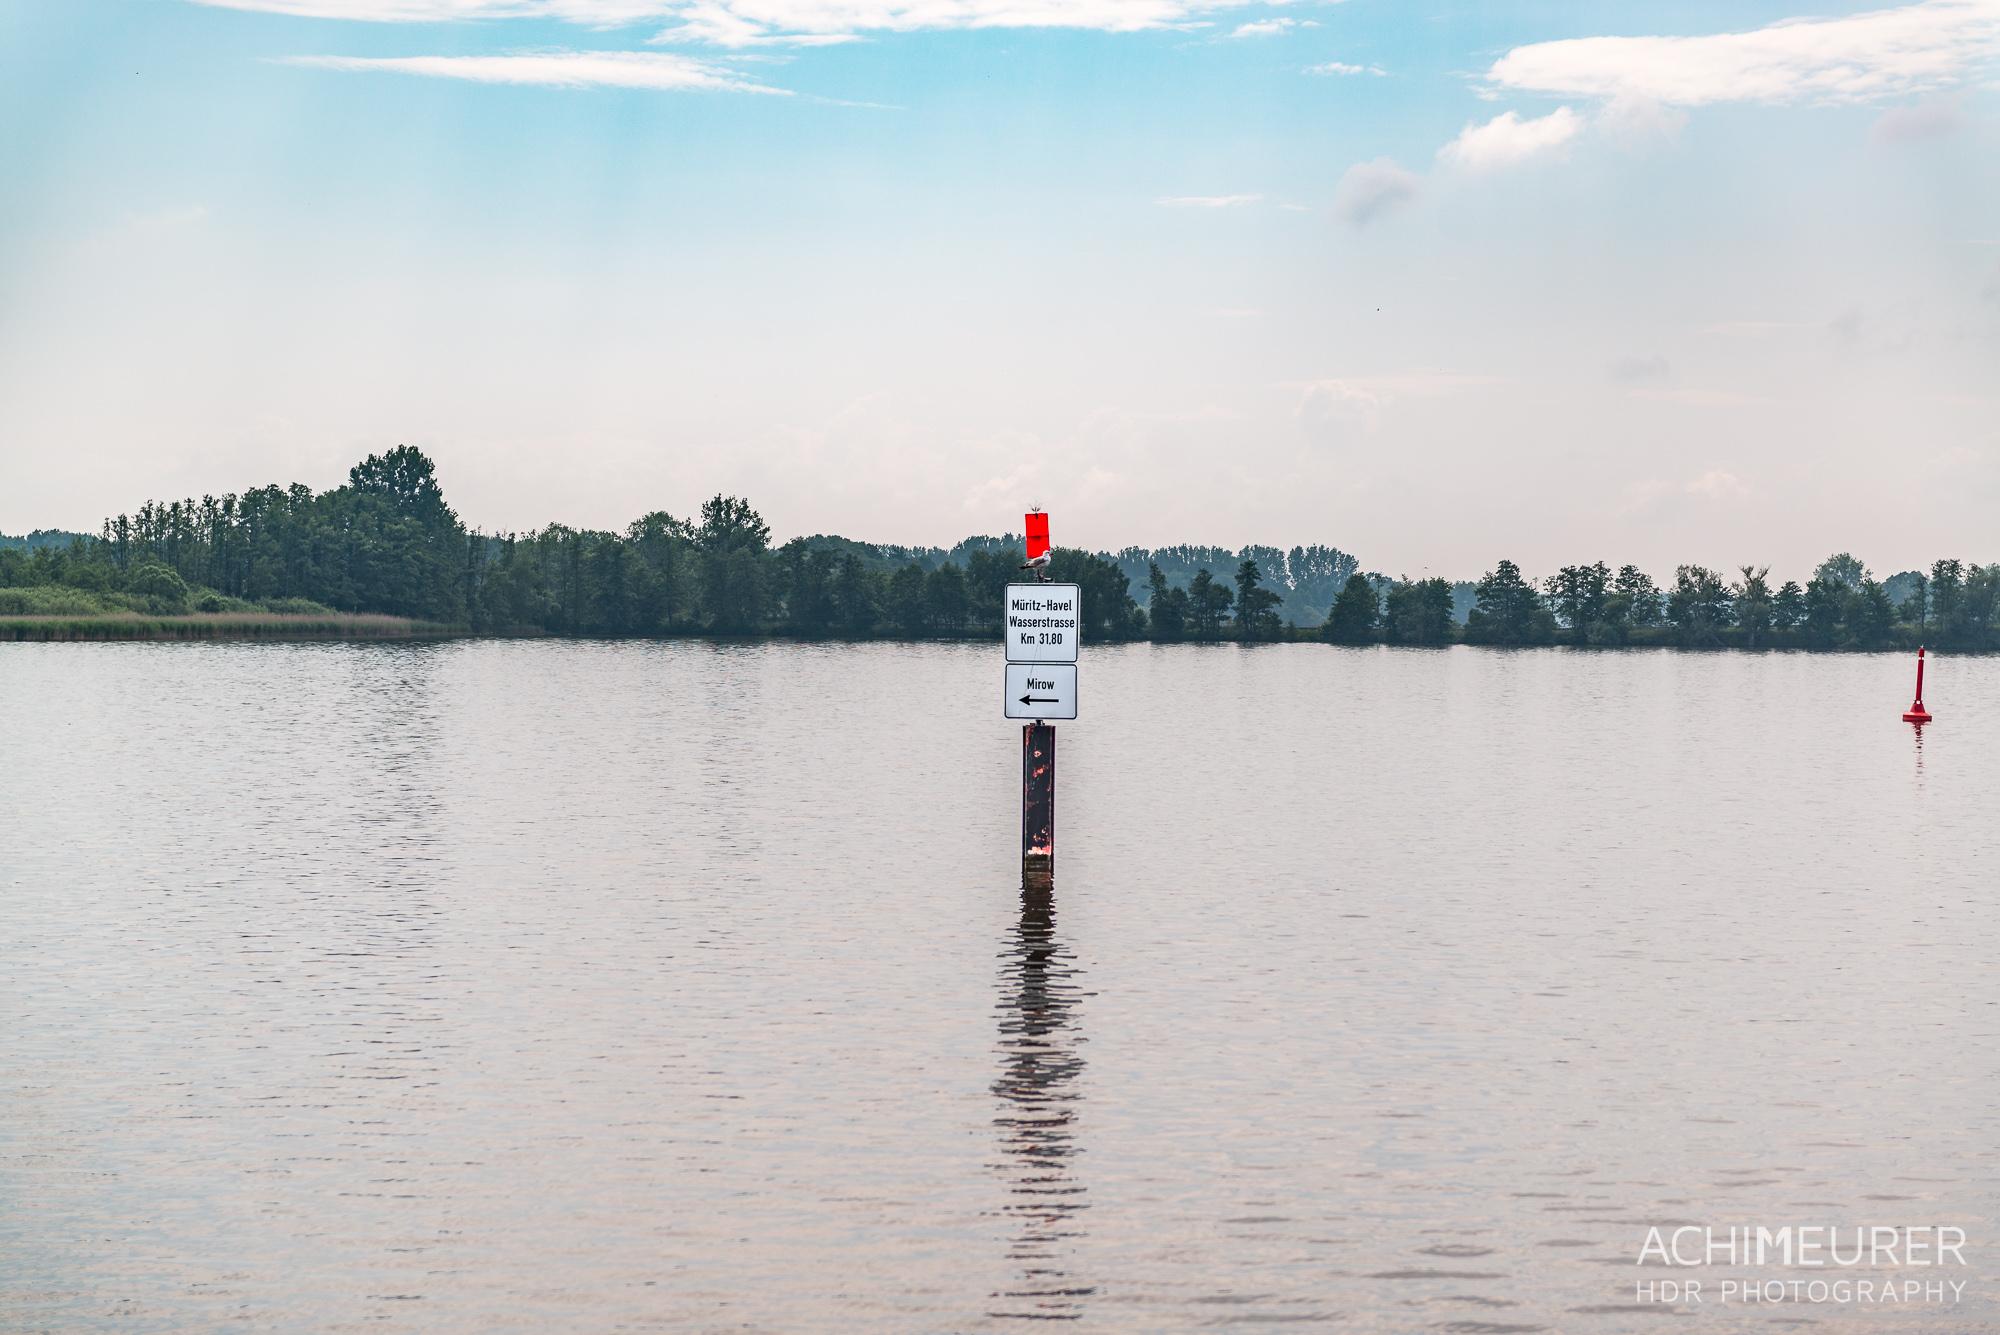 Hausboot-Kuhnle-Mueritz-Mecklenburg-Vorpommern-See_2577